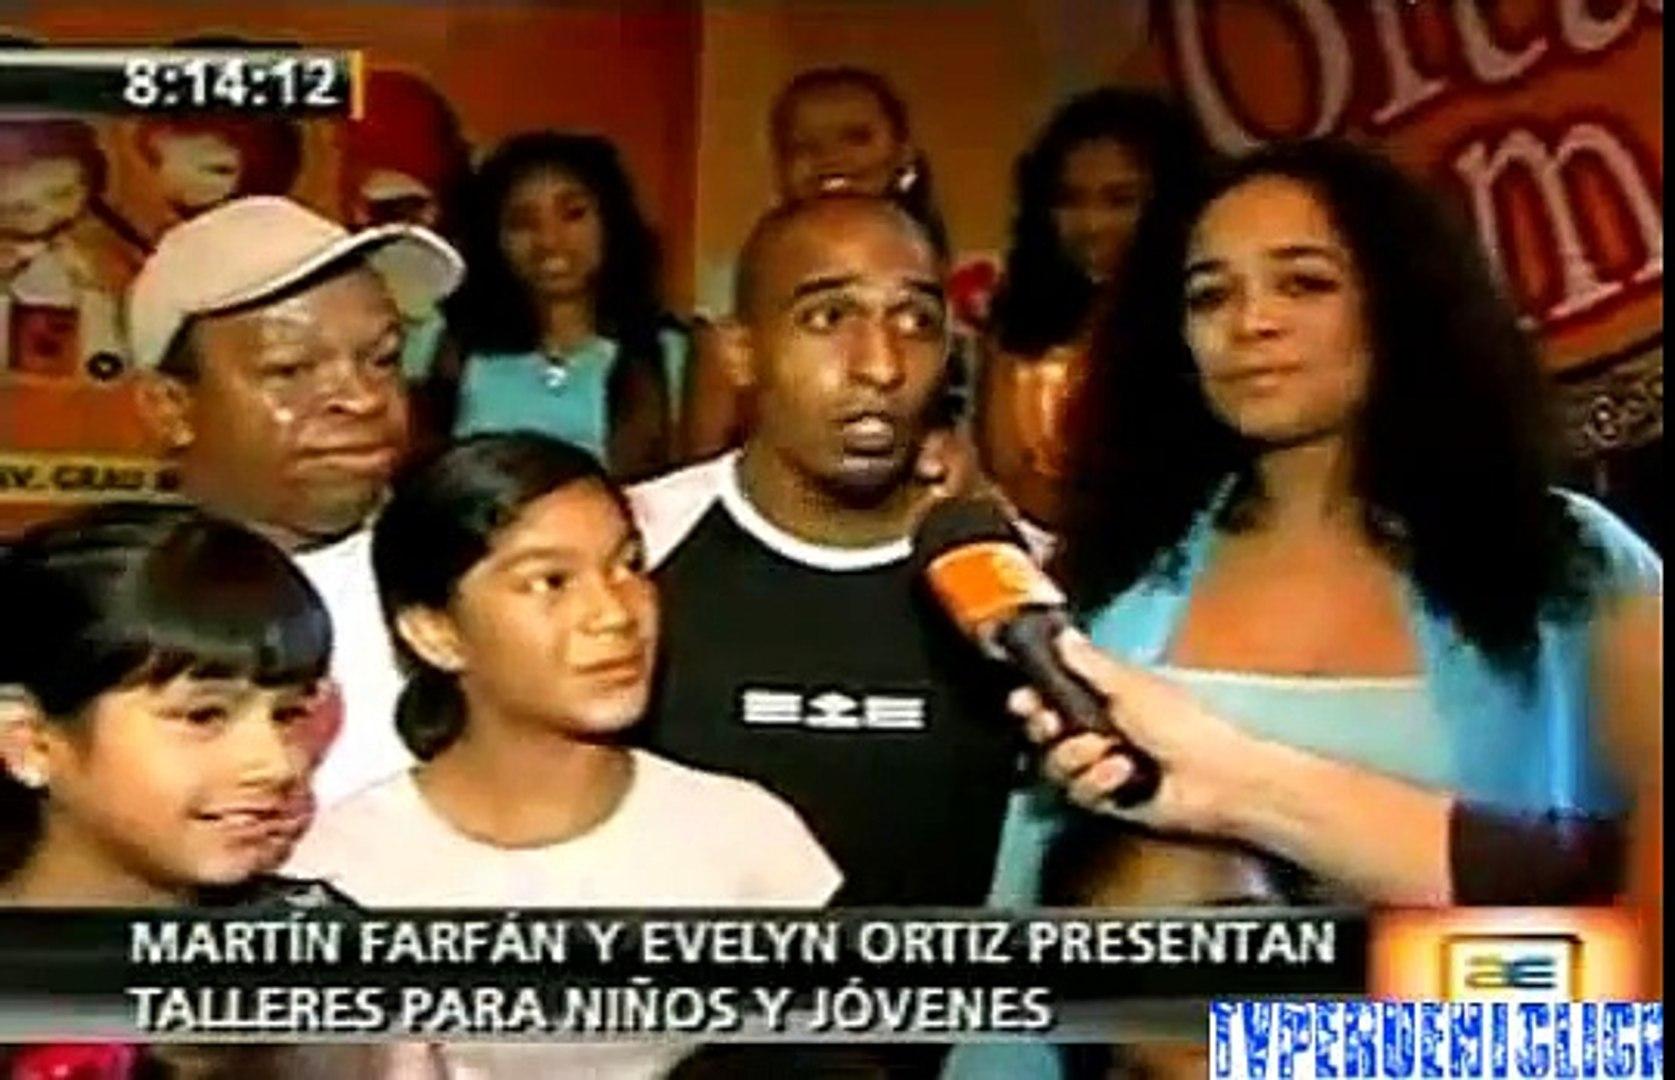 AMERICA ESPECTACULOS 16-02-2010 MATIN FARFAN Y EVELYN ORTIZ PRESENTAN TALLERES PARA NINOS